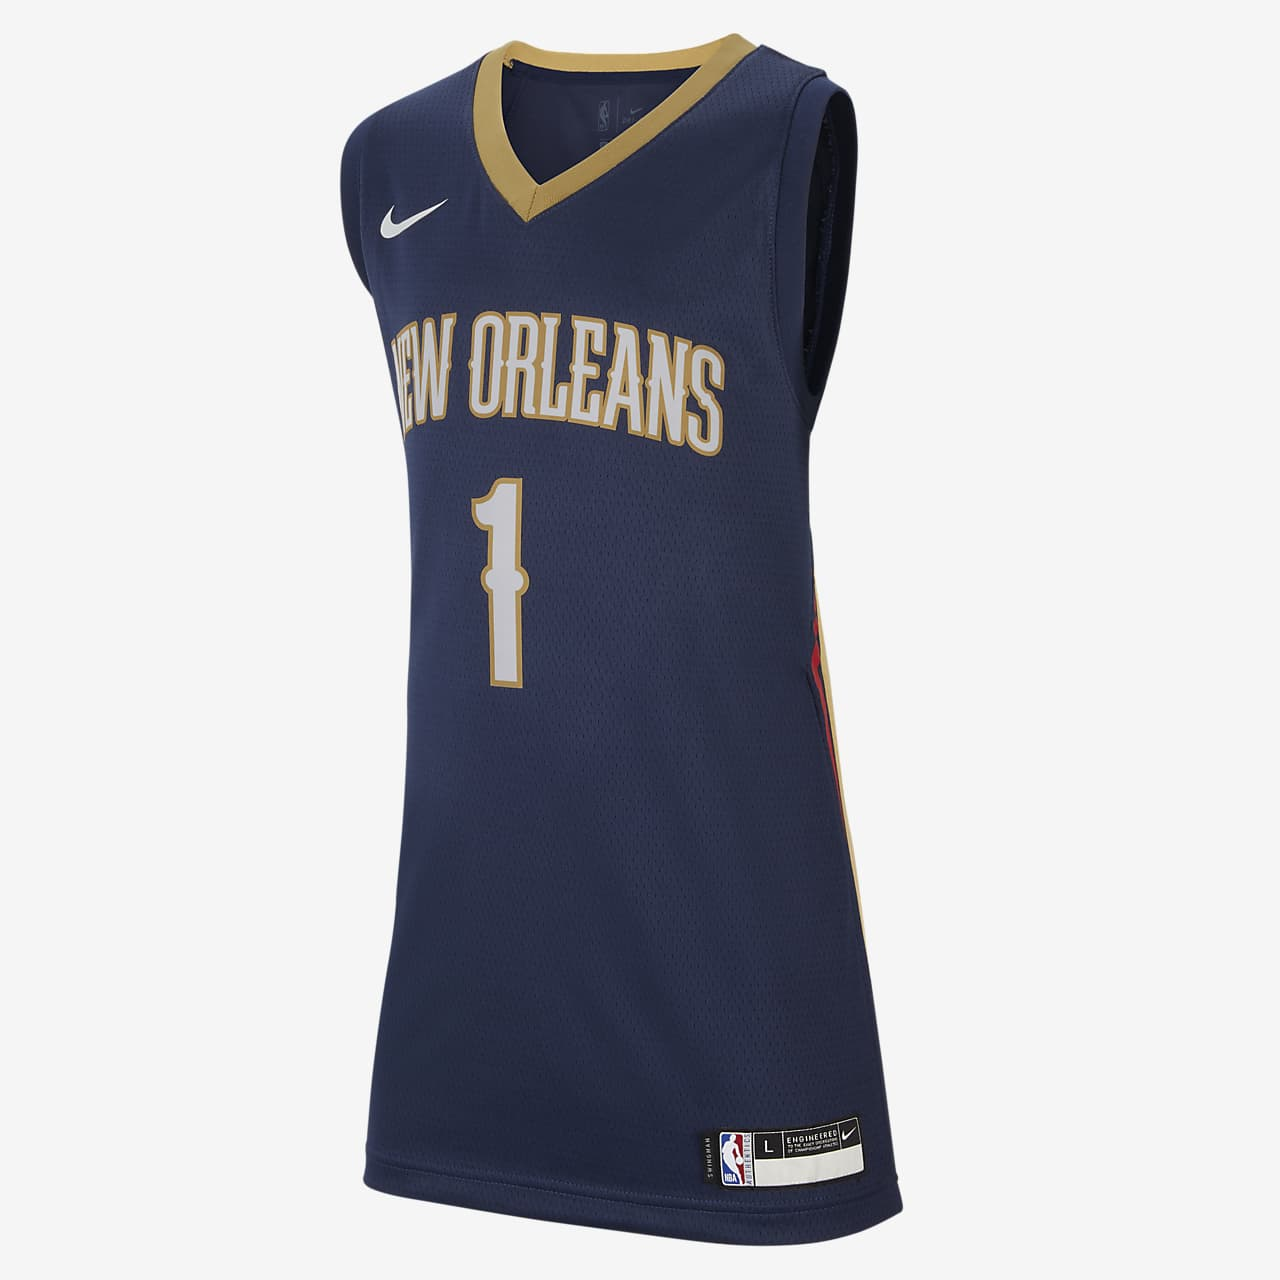 Camisola NBA da Nike Swingman Pelicans Icon Edition Júnior